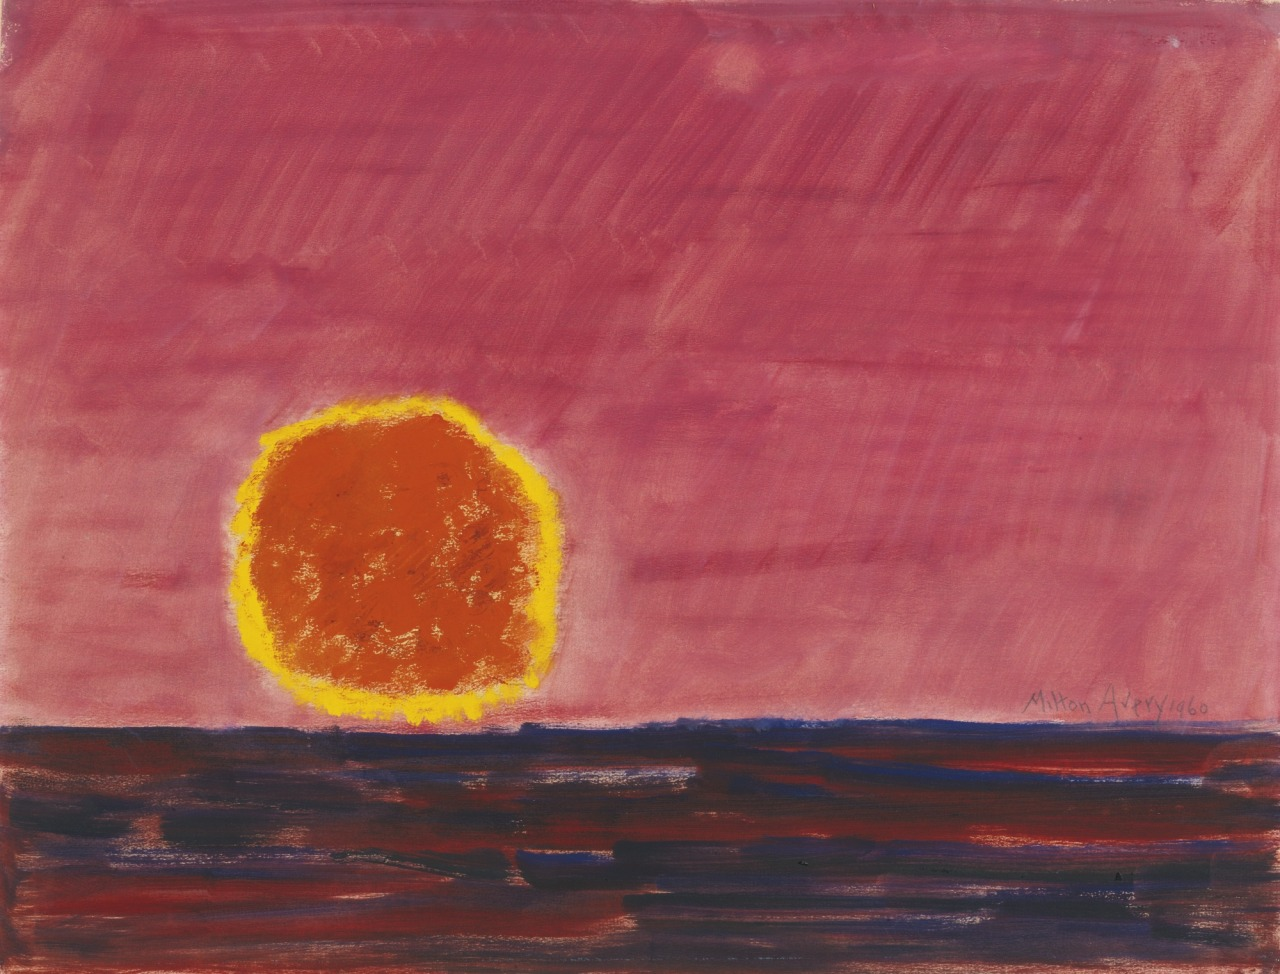 thunderstruck9:Milton Avery (American, 1885-1965), Ringed Sun, 1960. Oil on paper, 171/2 x 23 in.